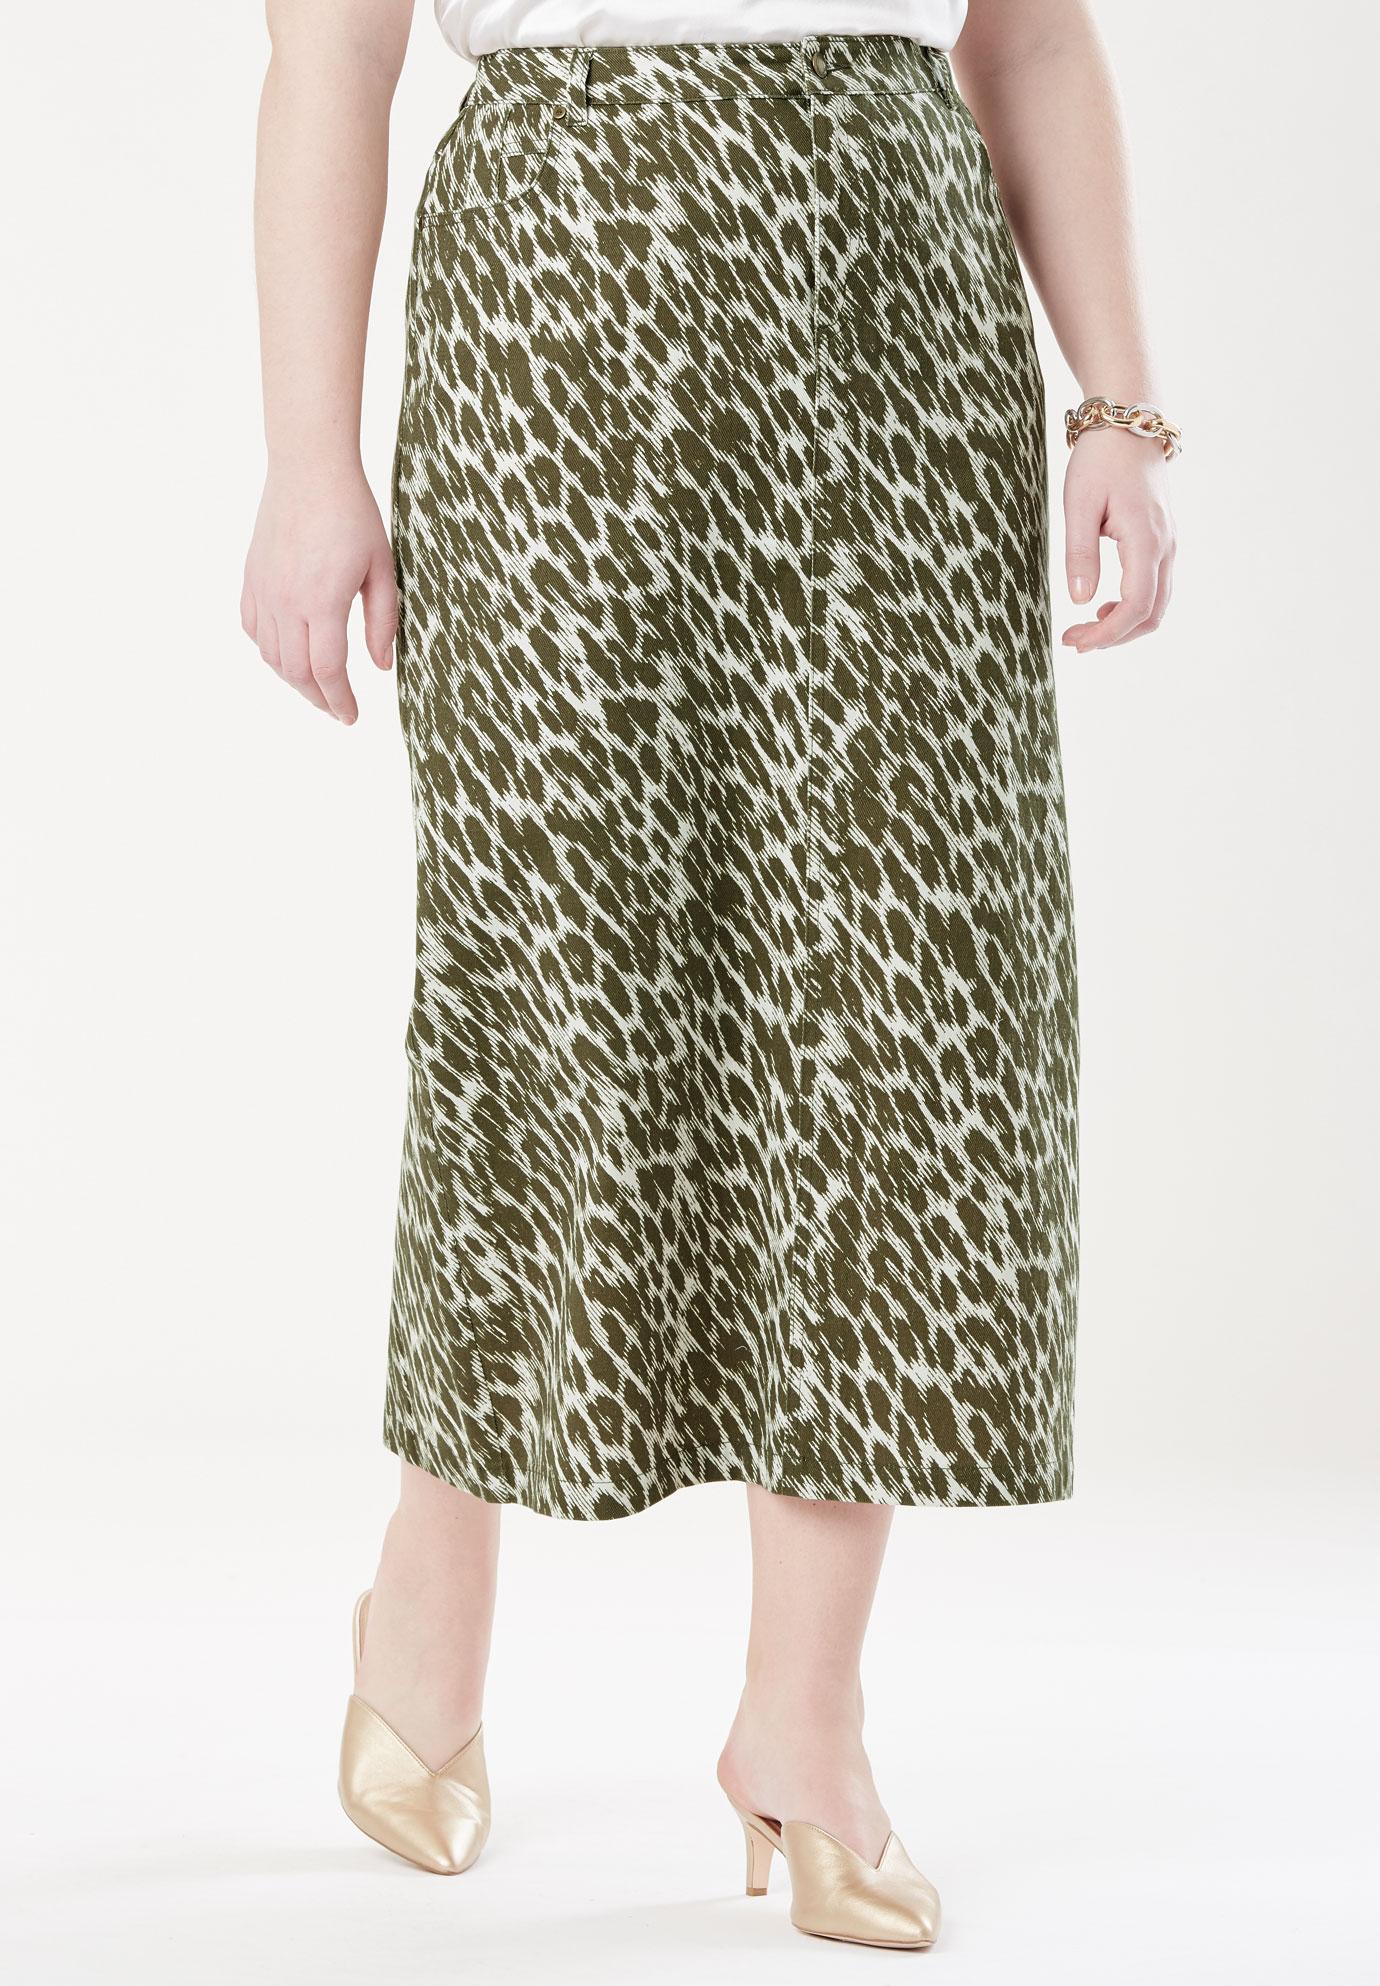 5483f7b5f9 Classic Cotton Denim Long Skirt| Plus Size Dresses | Jessica London